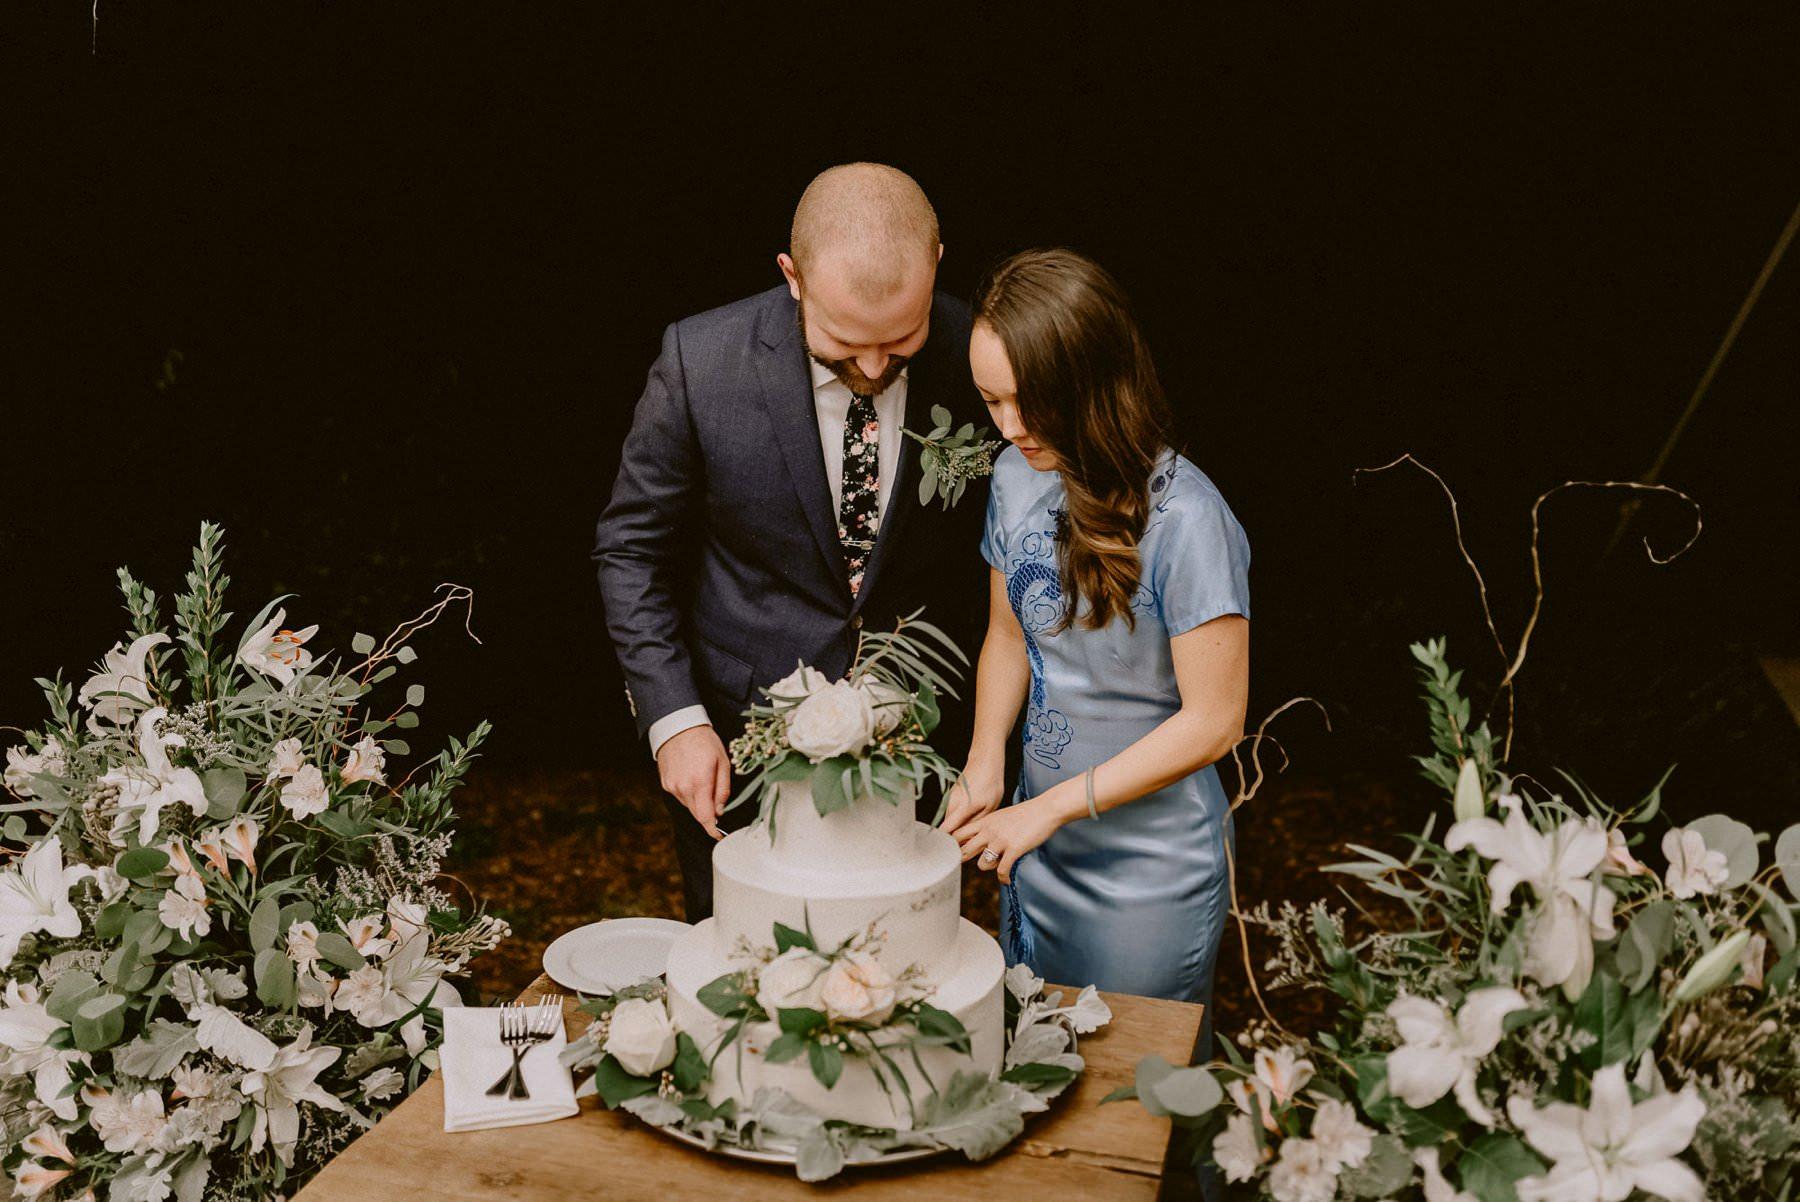 Tyler_arboretum_wedding-091.jpg